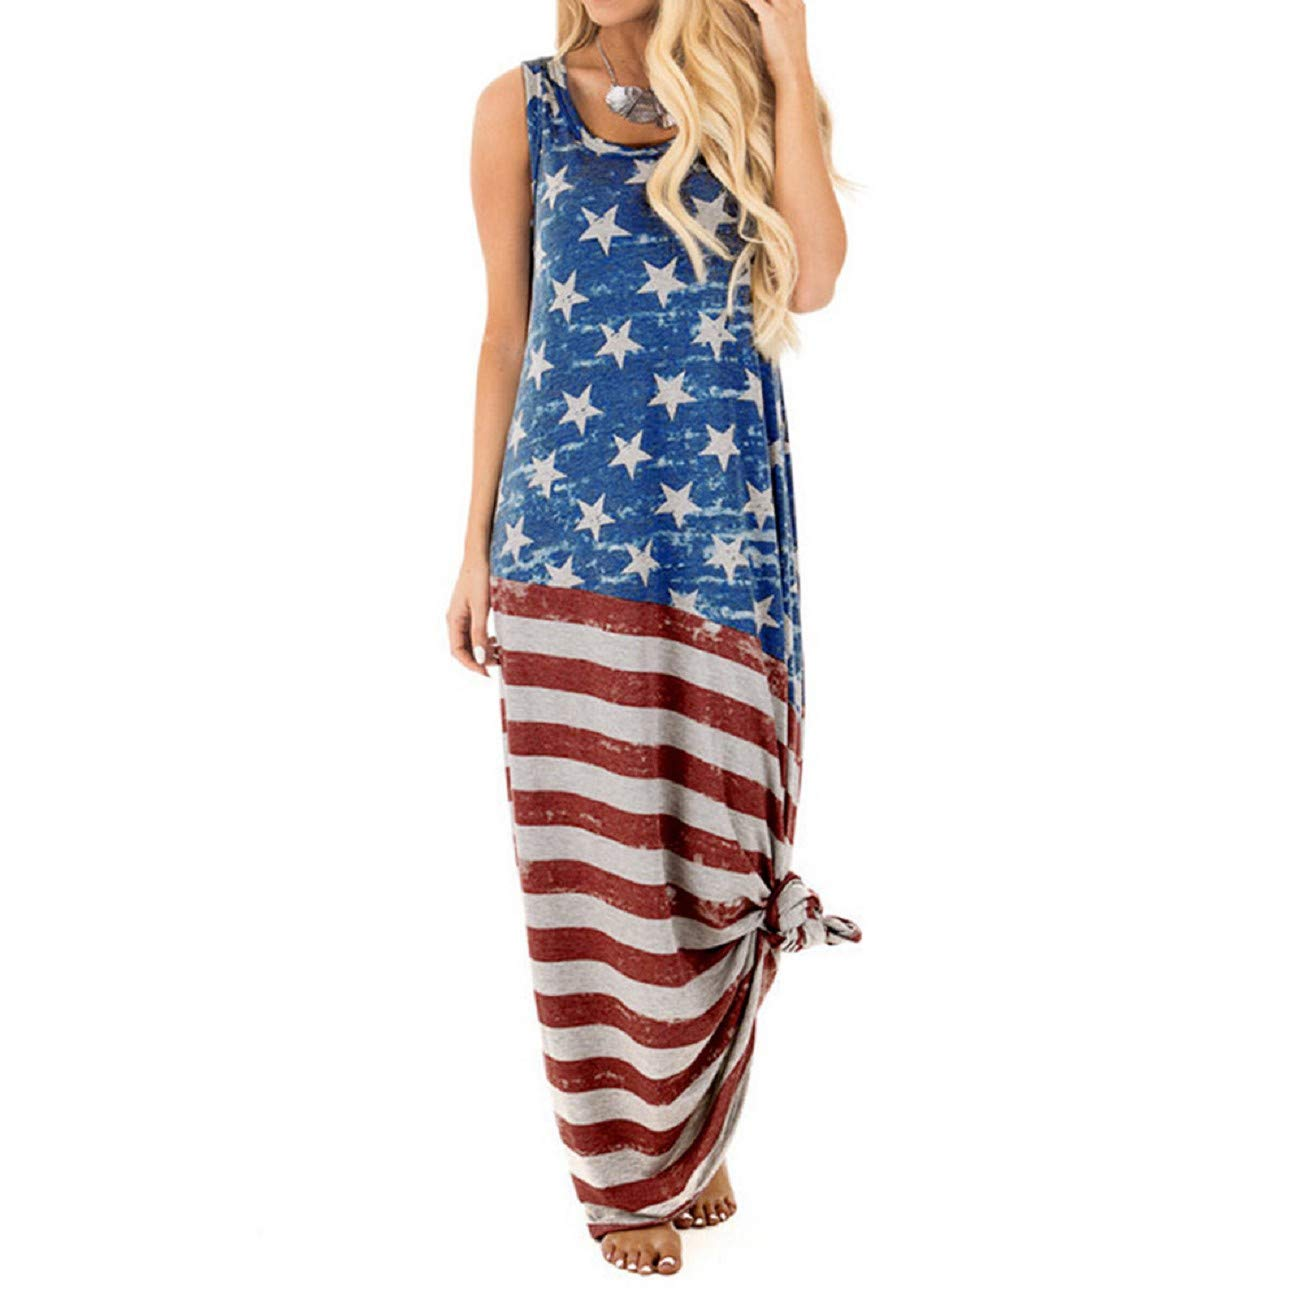 FAPIZI Women American Flag Print Round Neck Sleeveless Maxi Dress Summer Long Casual Loose Beach Dress 4th of July Blue